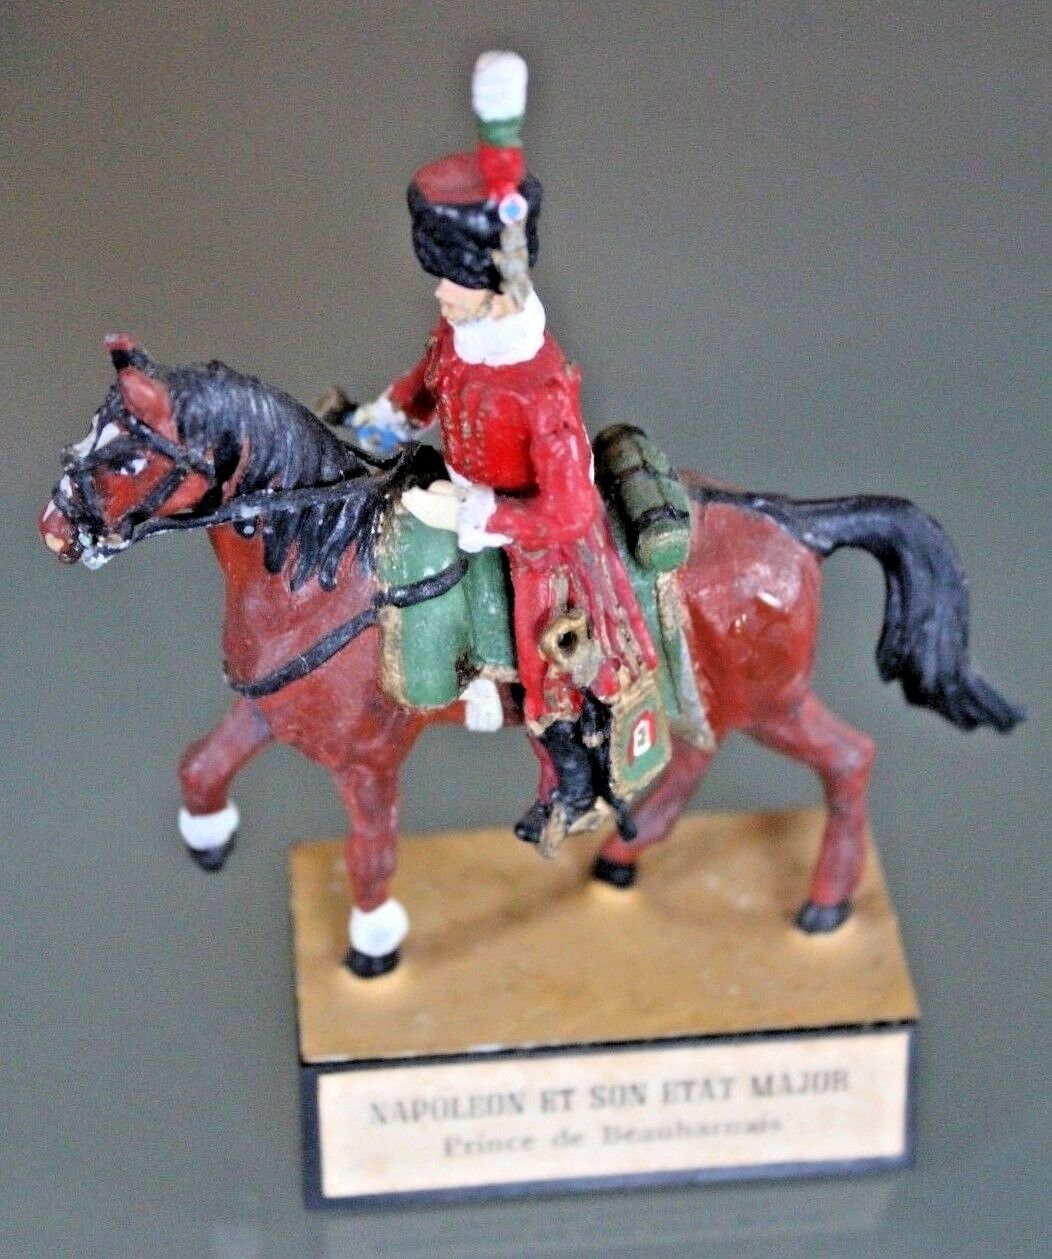 Soldat Blei ALMIRALL NAPOLEON seinem Zustand Major der beauharnais Pferd